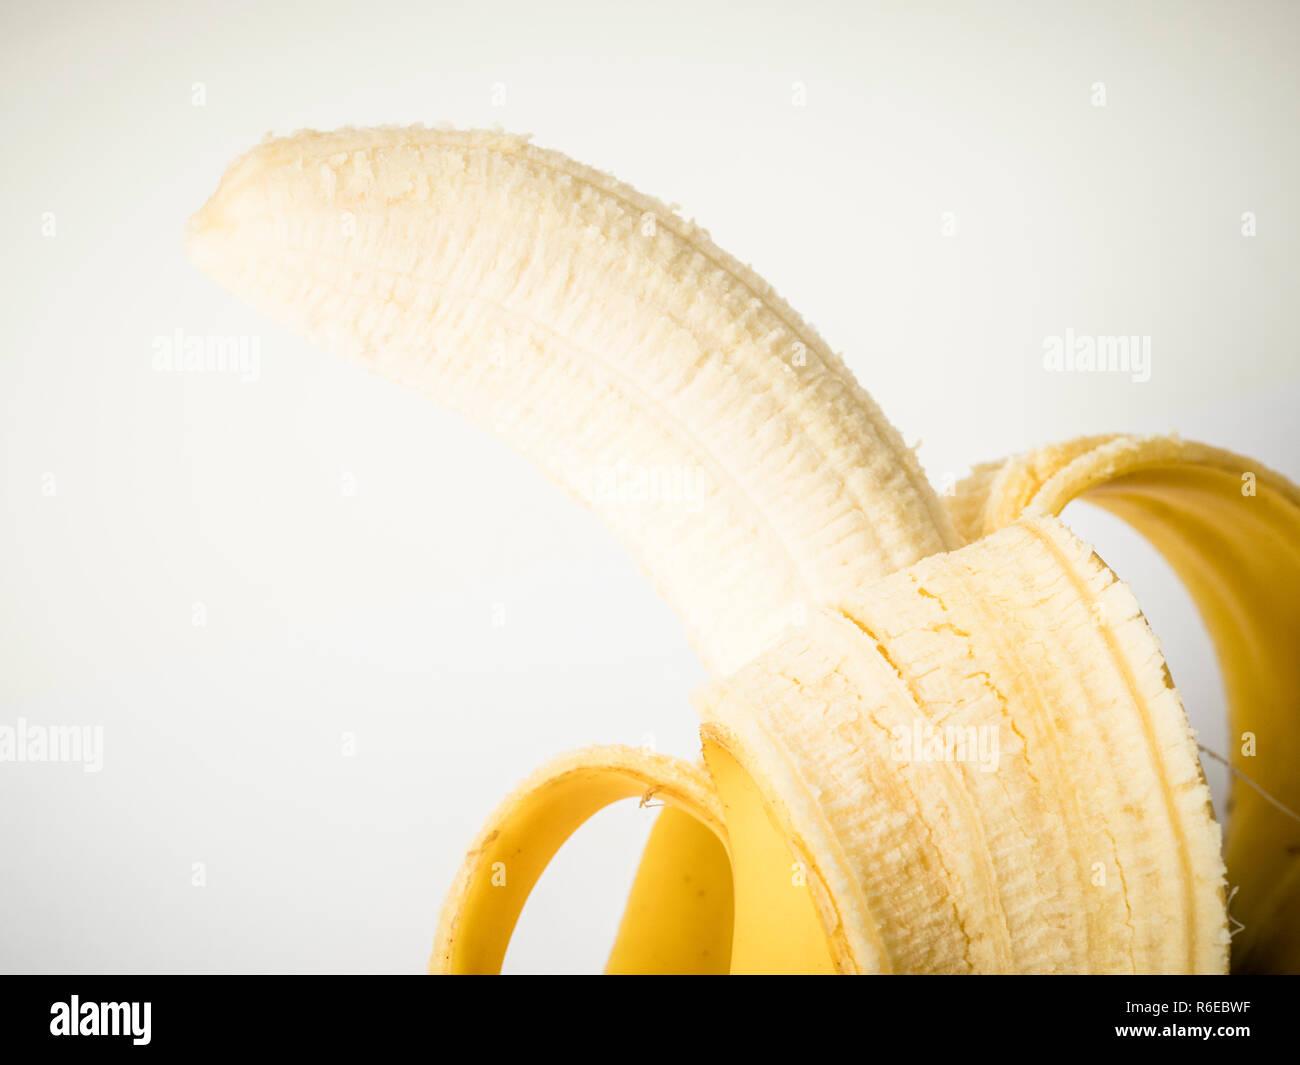 Close up of peeled banana - Stock Image